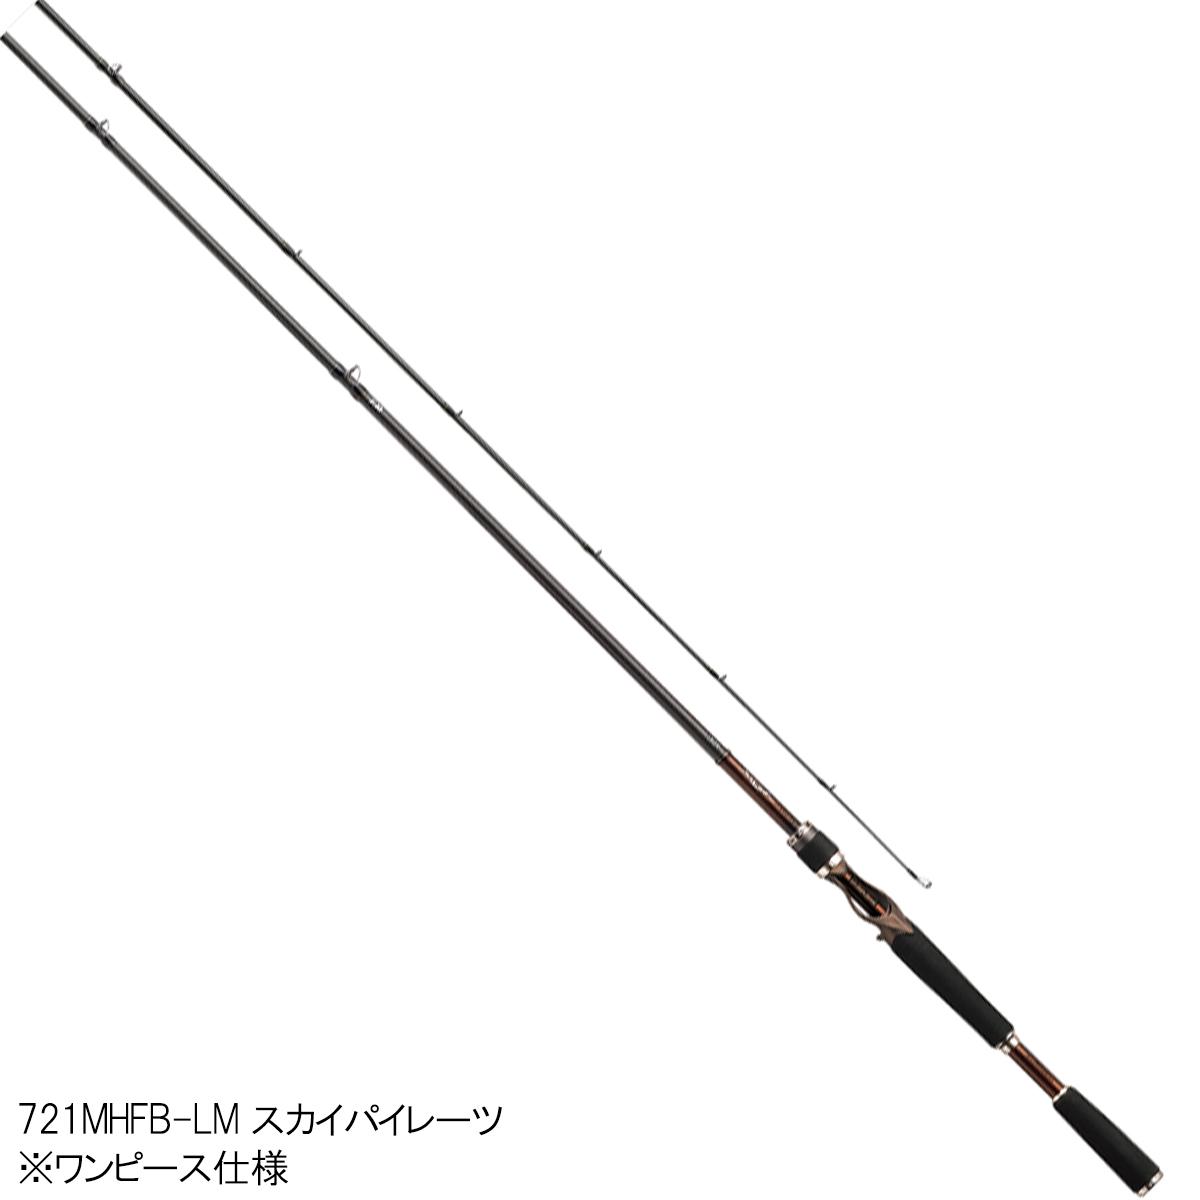 Daiwa (Daiwa) Tees bait casting model 721MHFB-LM sky Pirates